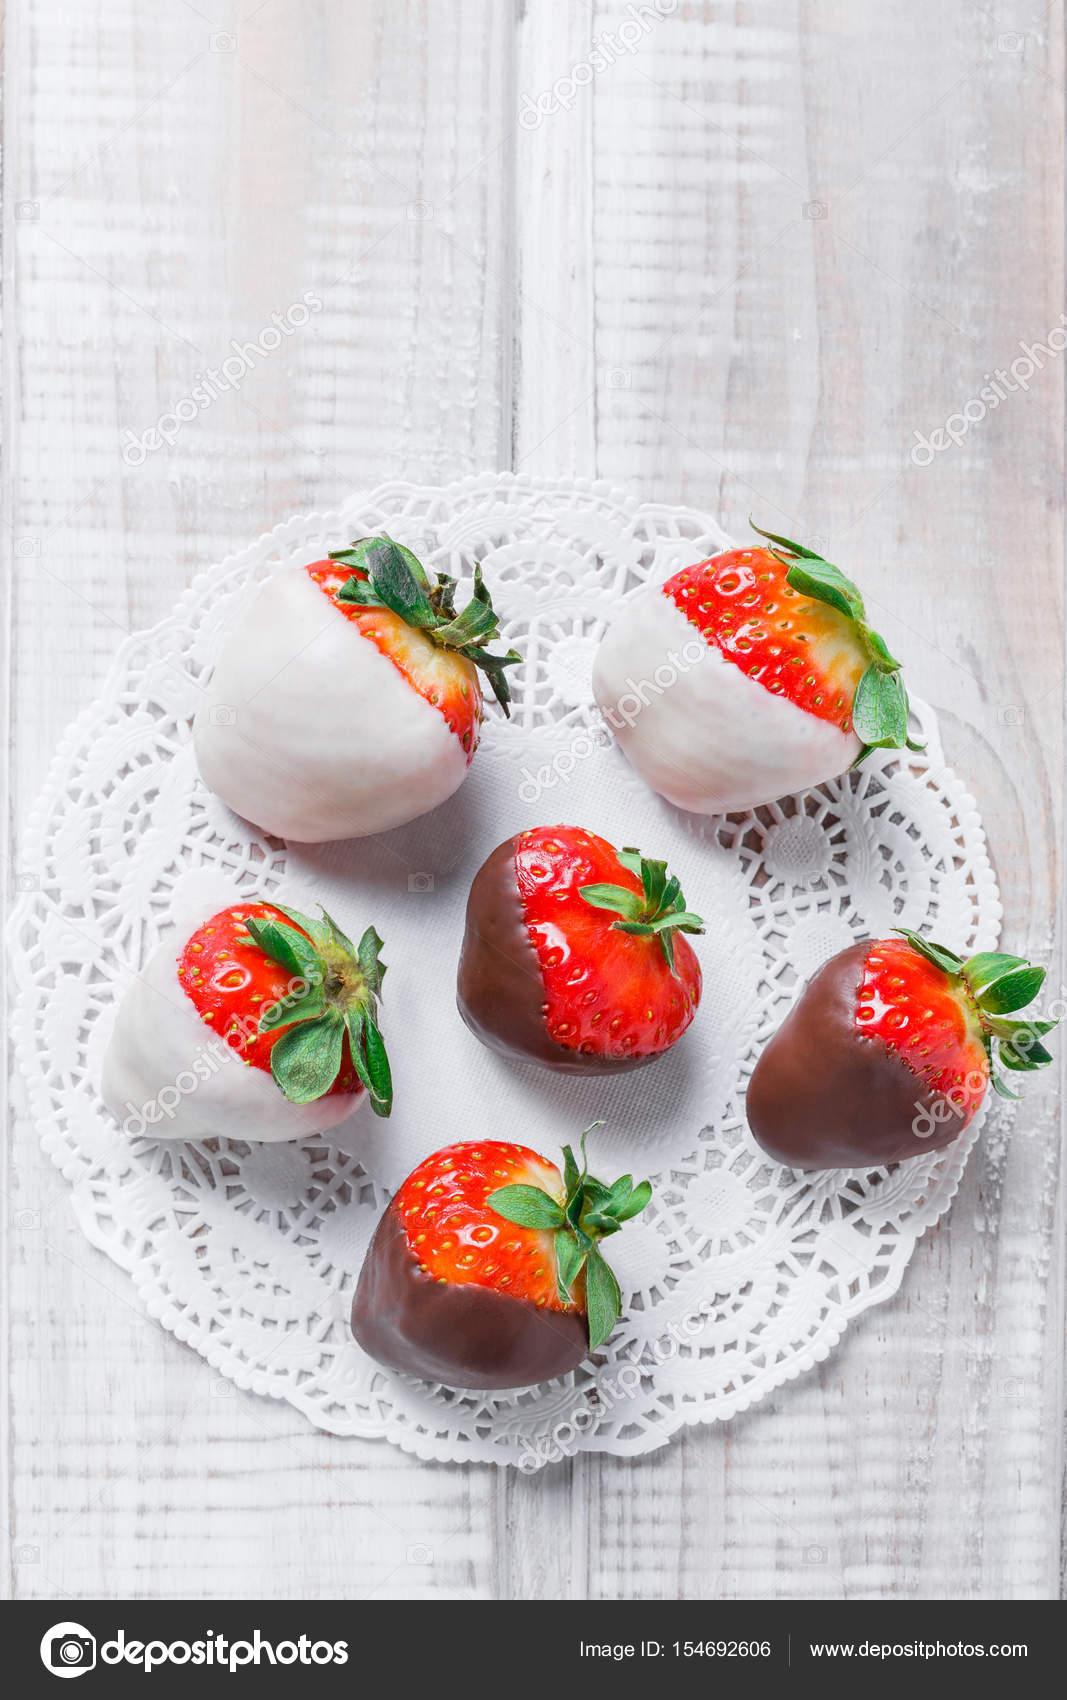 Fresh Strawberries Dipped In Dark And White Chocolate On Light